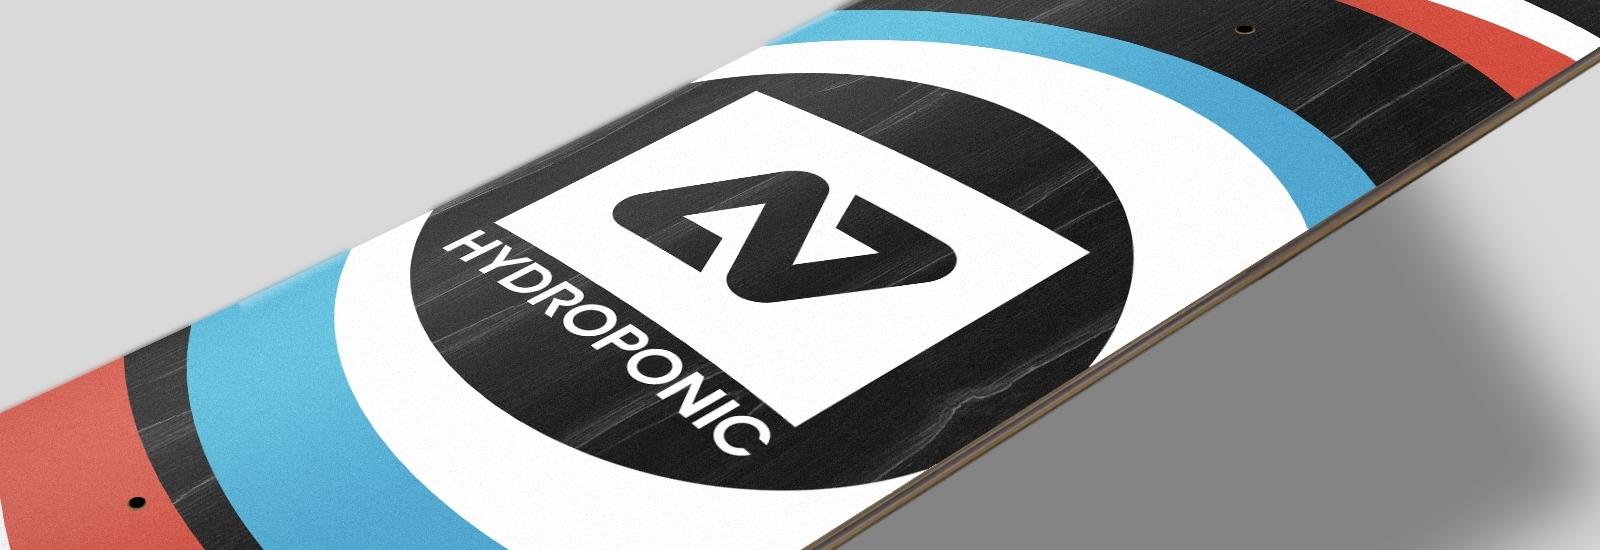 Skate Decks - Hydroponic